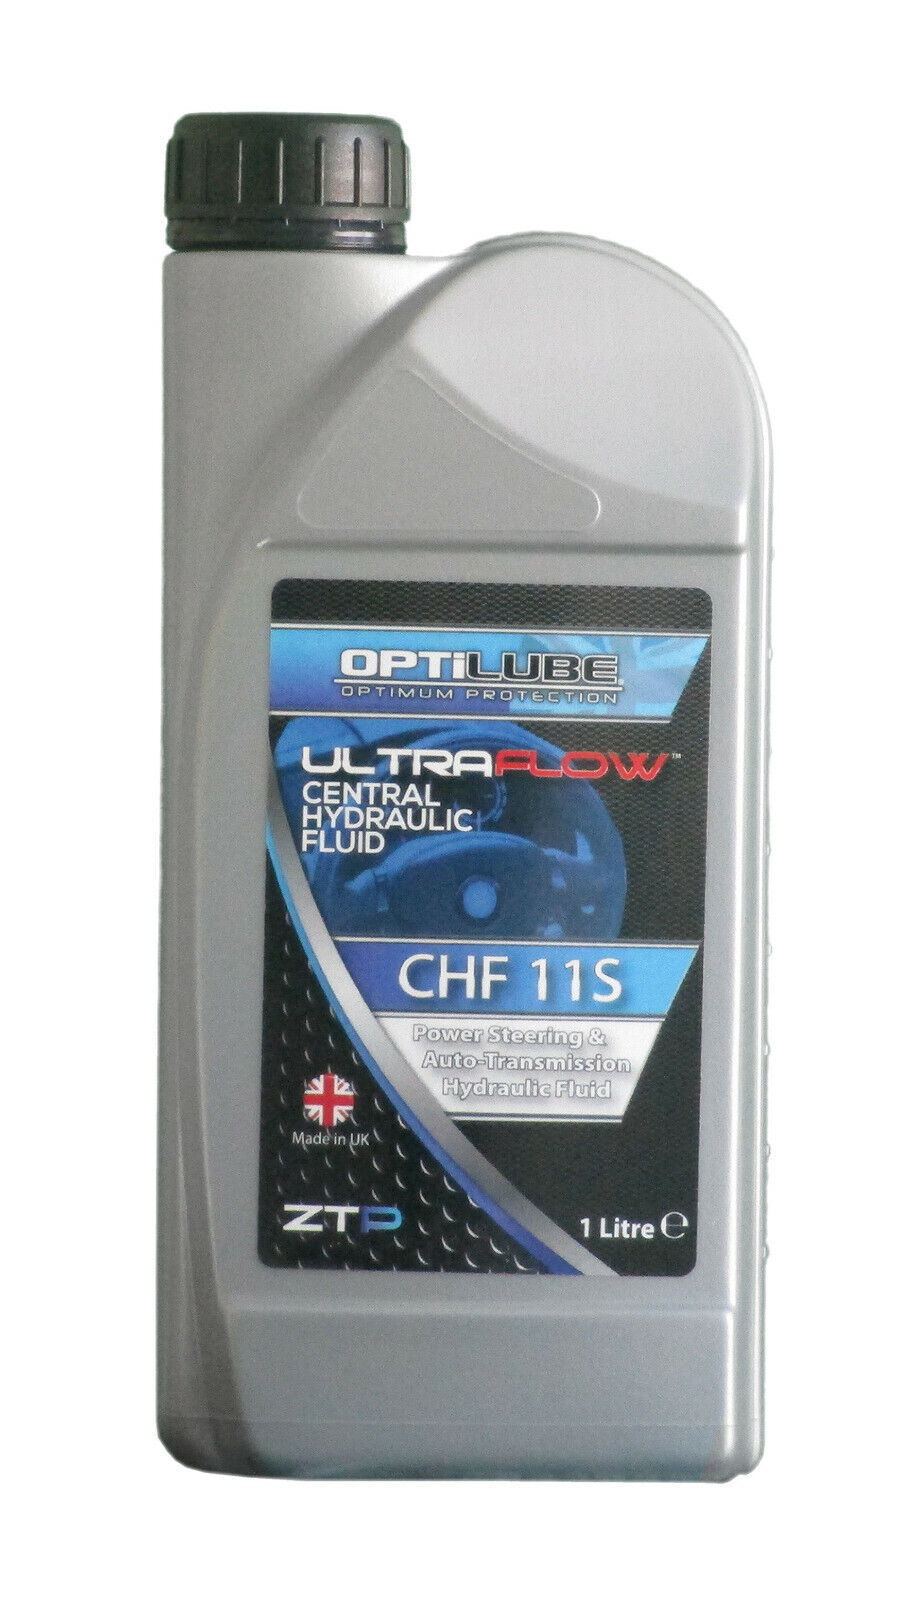 Central Hydraulic Fluid Power Steering Oil 1 Litre 1L Optilube